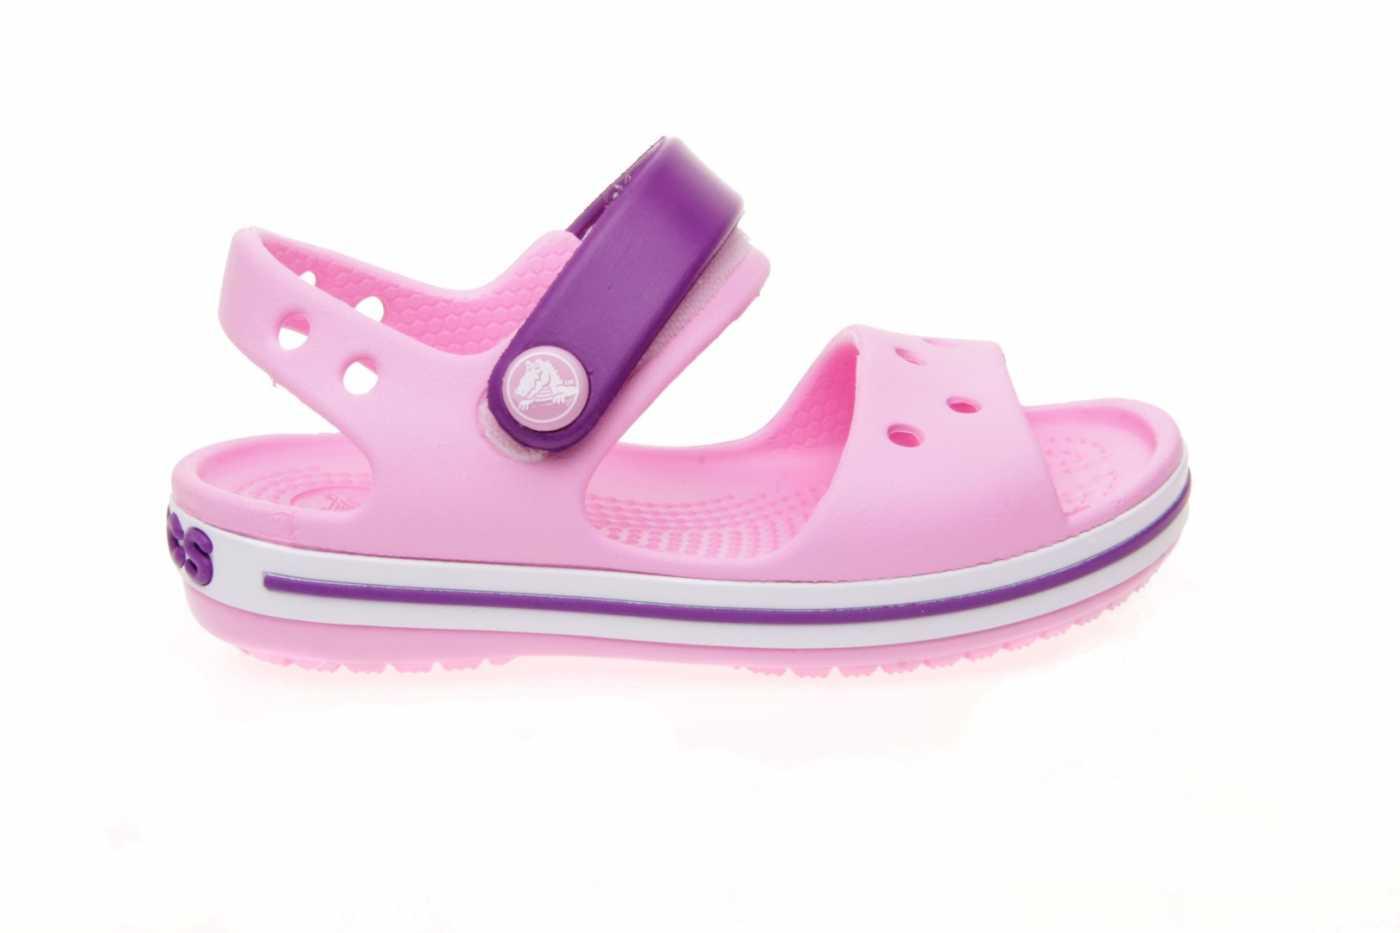 5a820670425 Comprar zapato tipo JOVEN NIÑA estilo SANDALIA COLOR ROSA SINTETICO